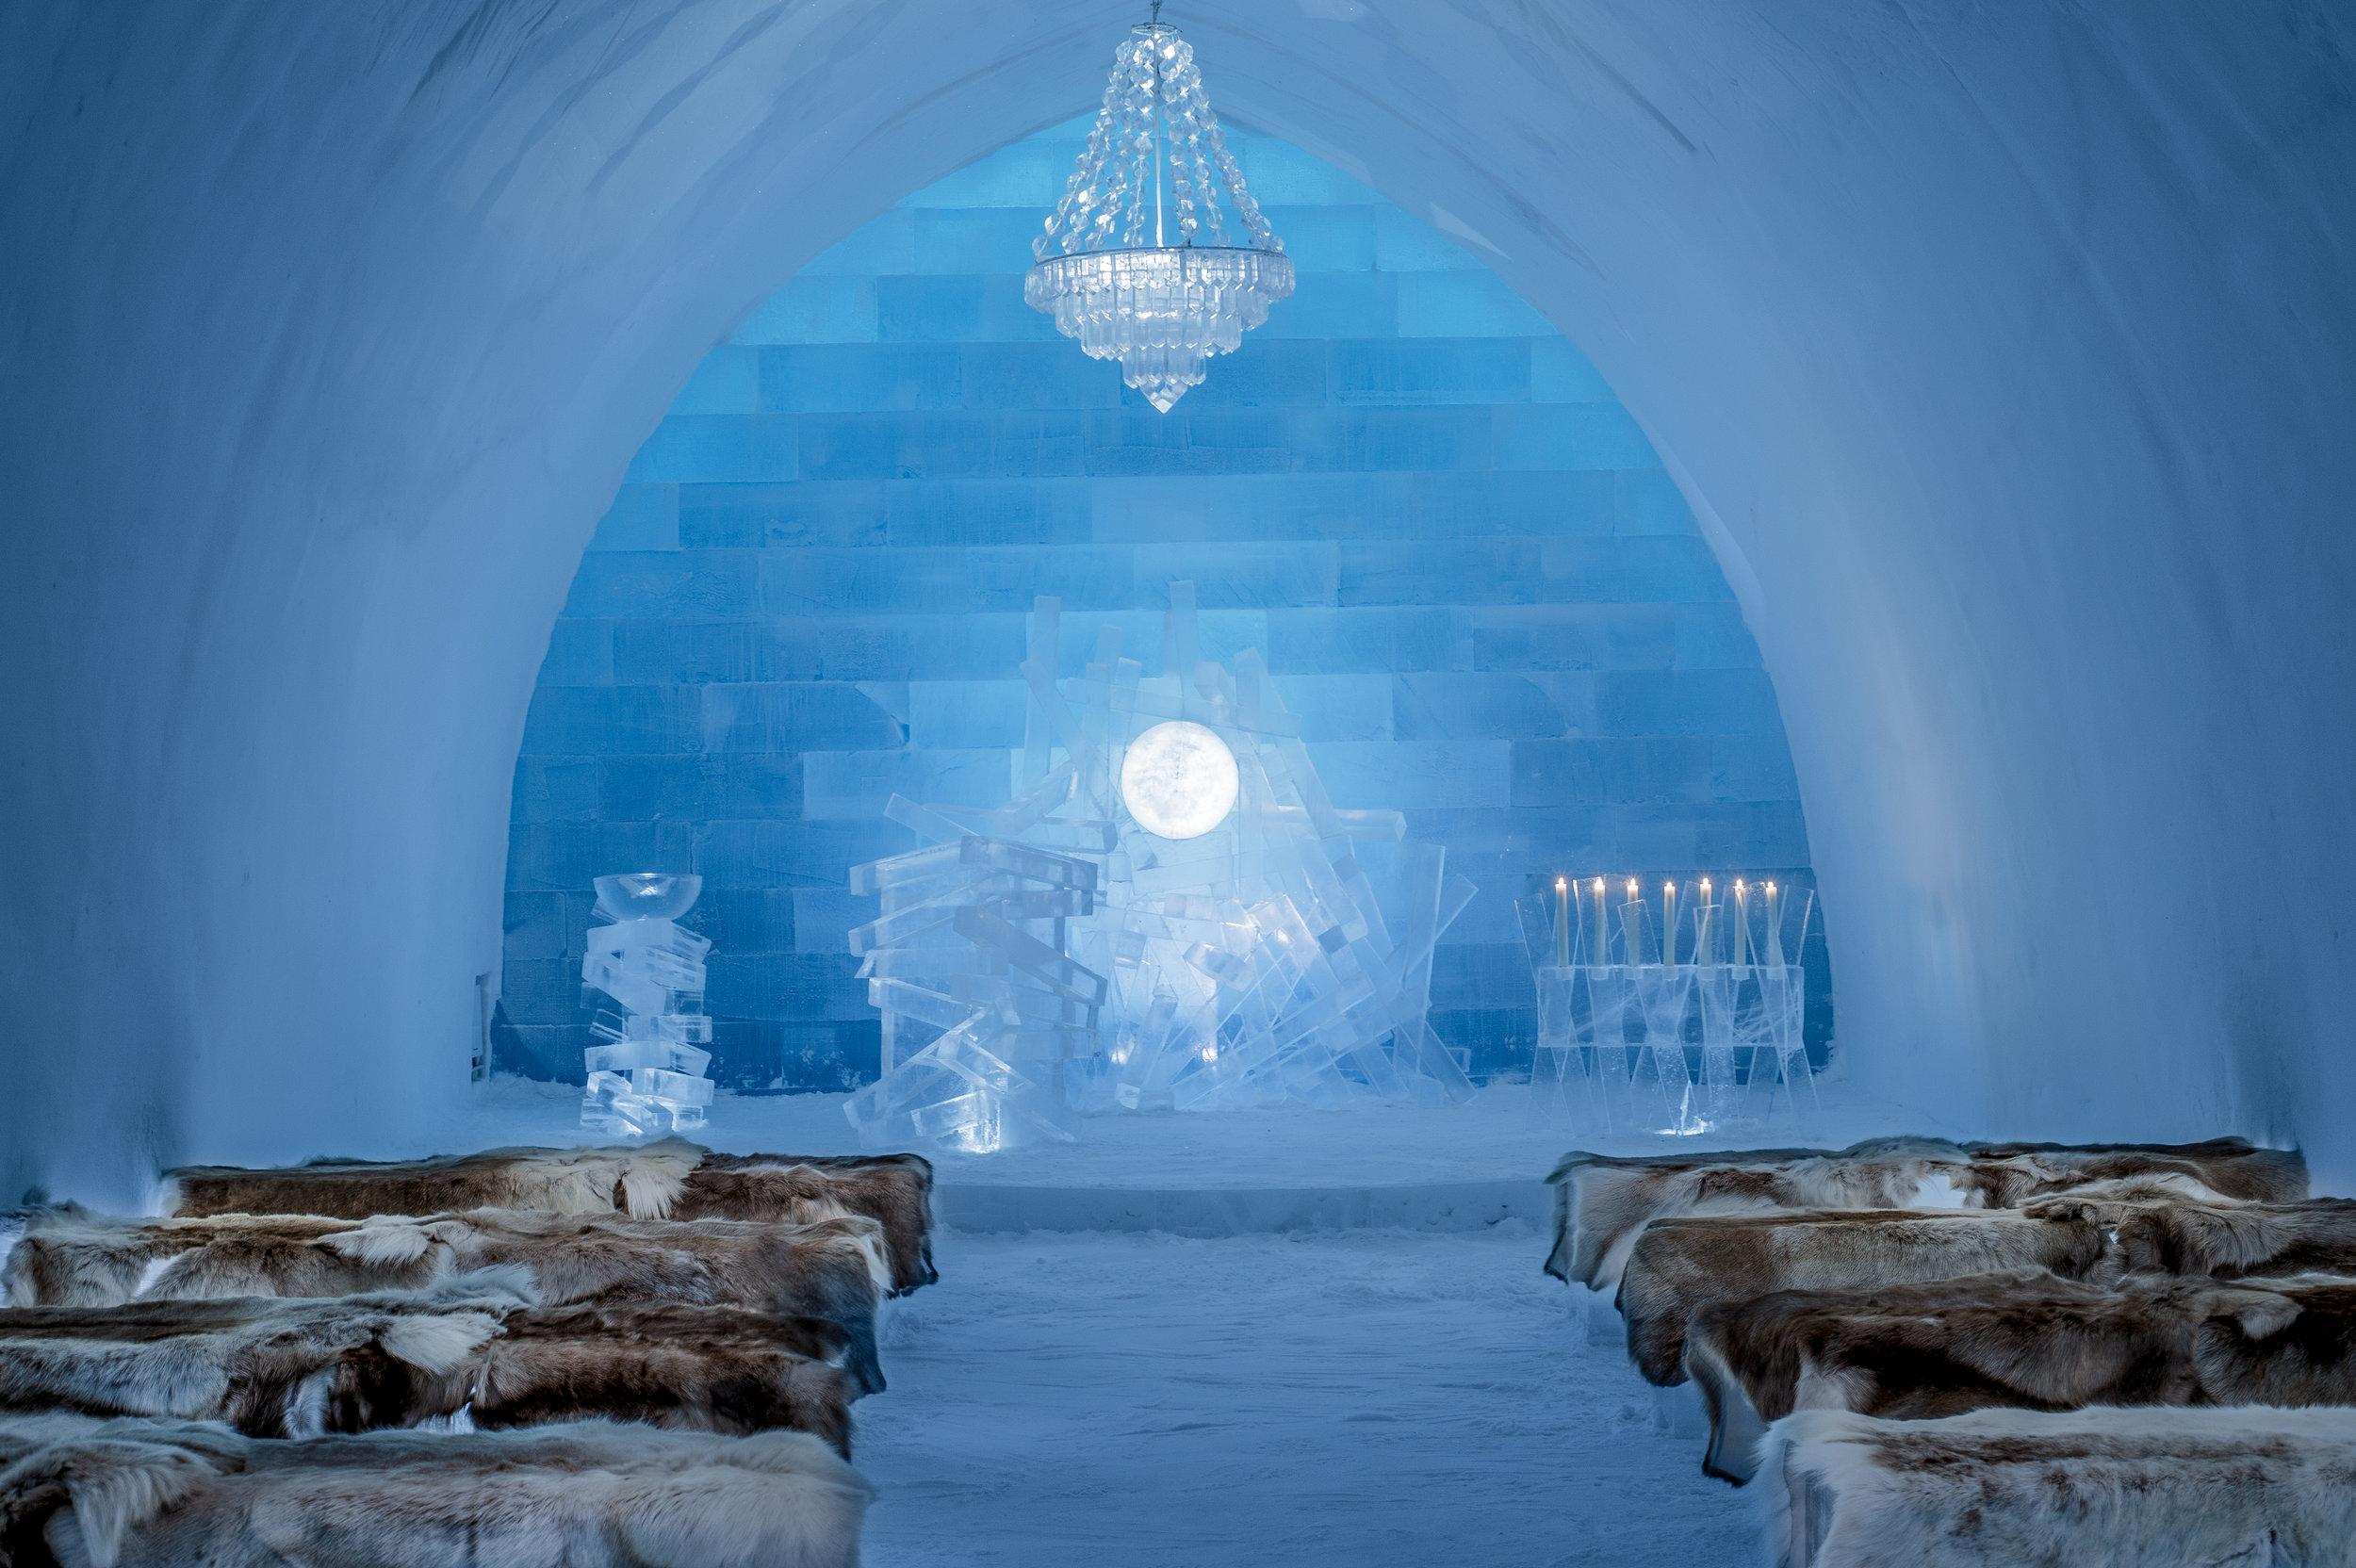 icechurch - icehotel27  - by Asaf Kliger.jpg